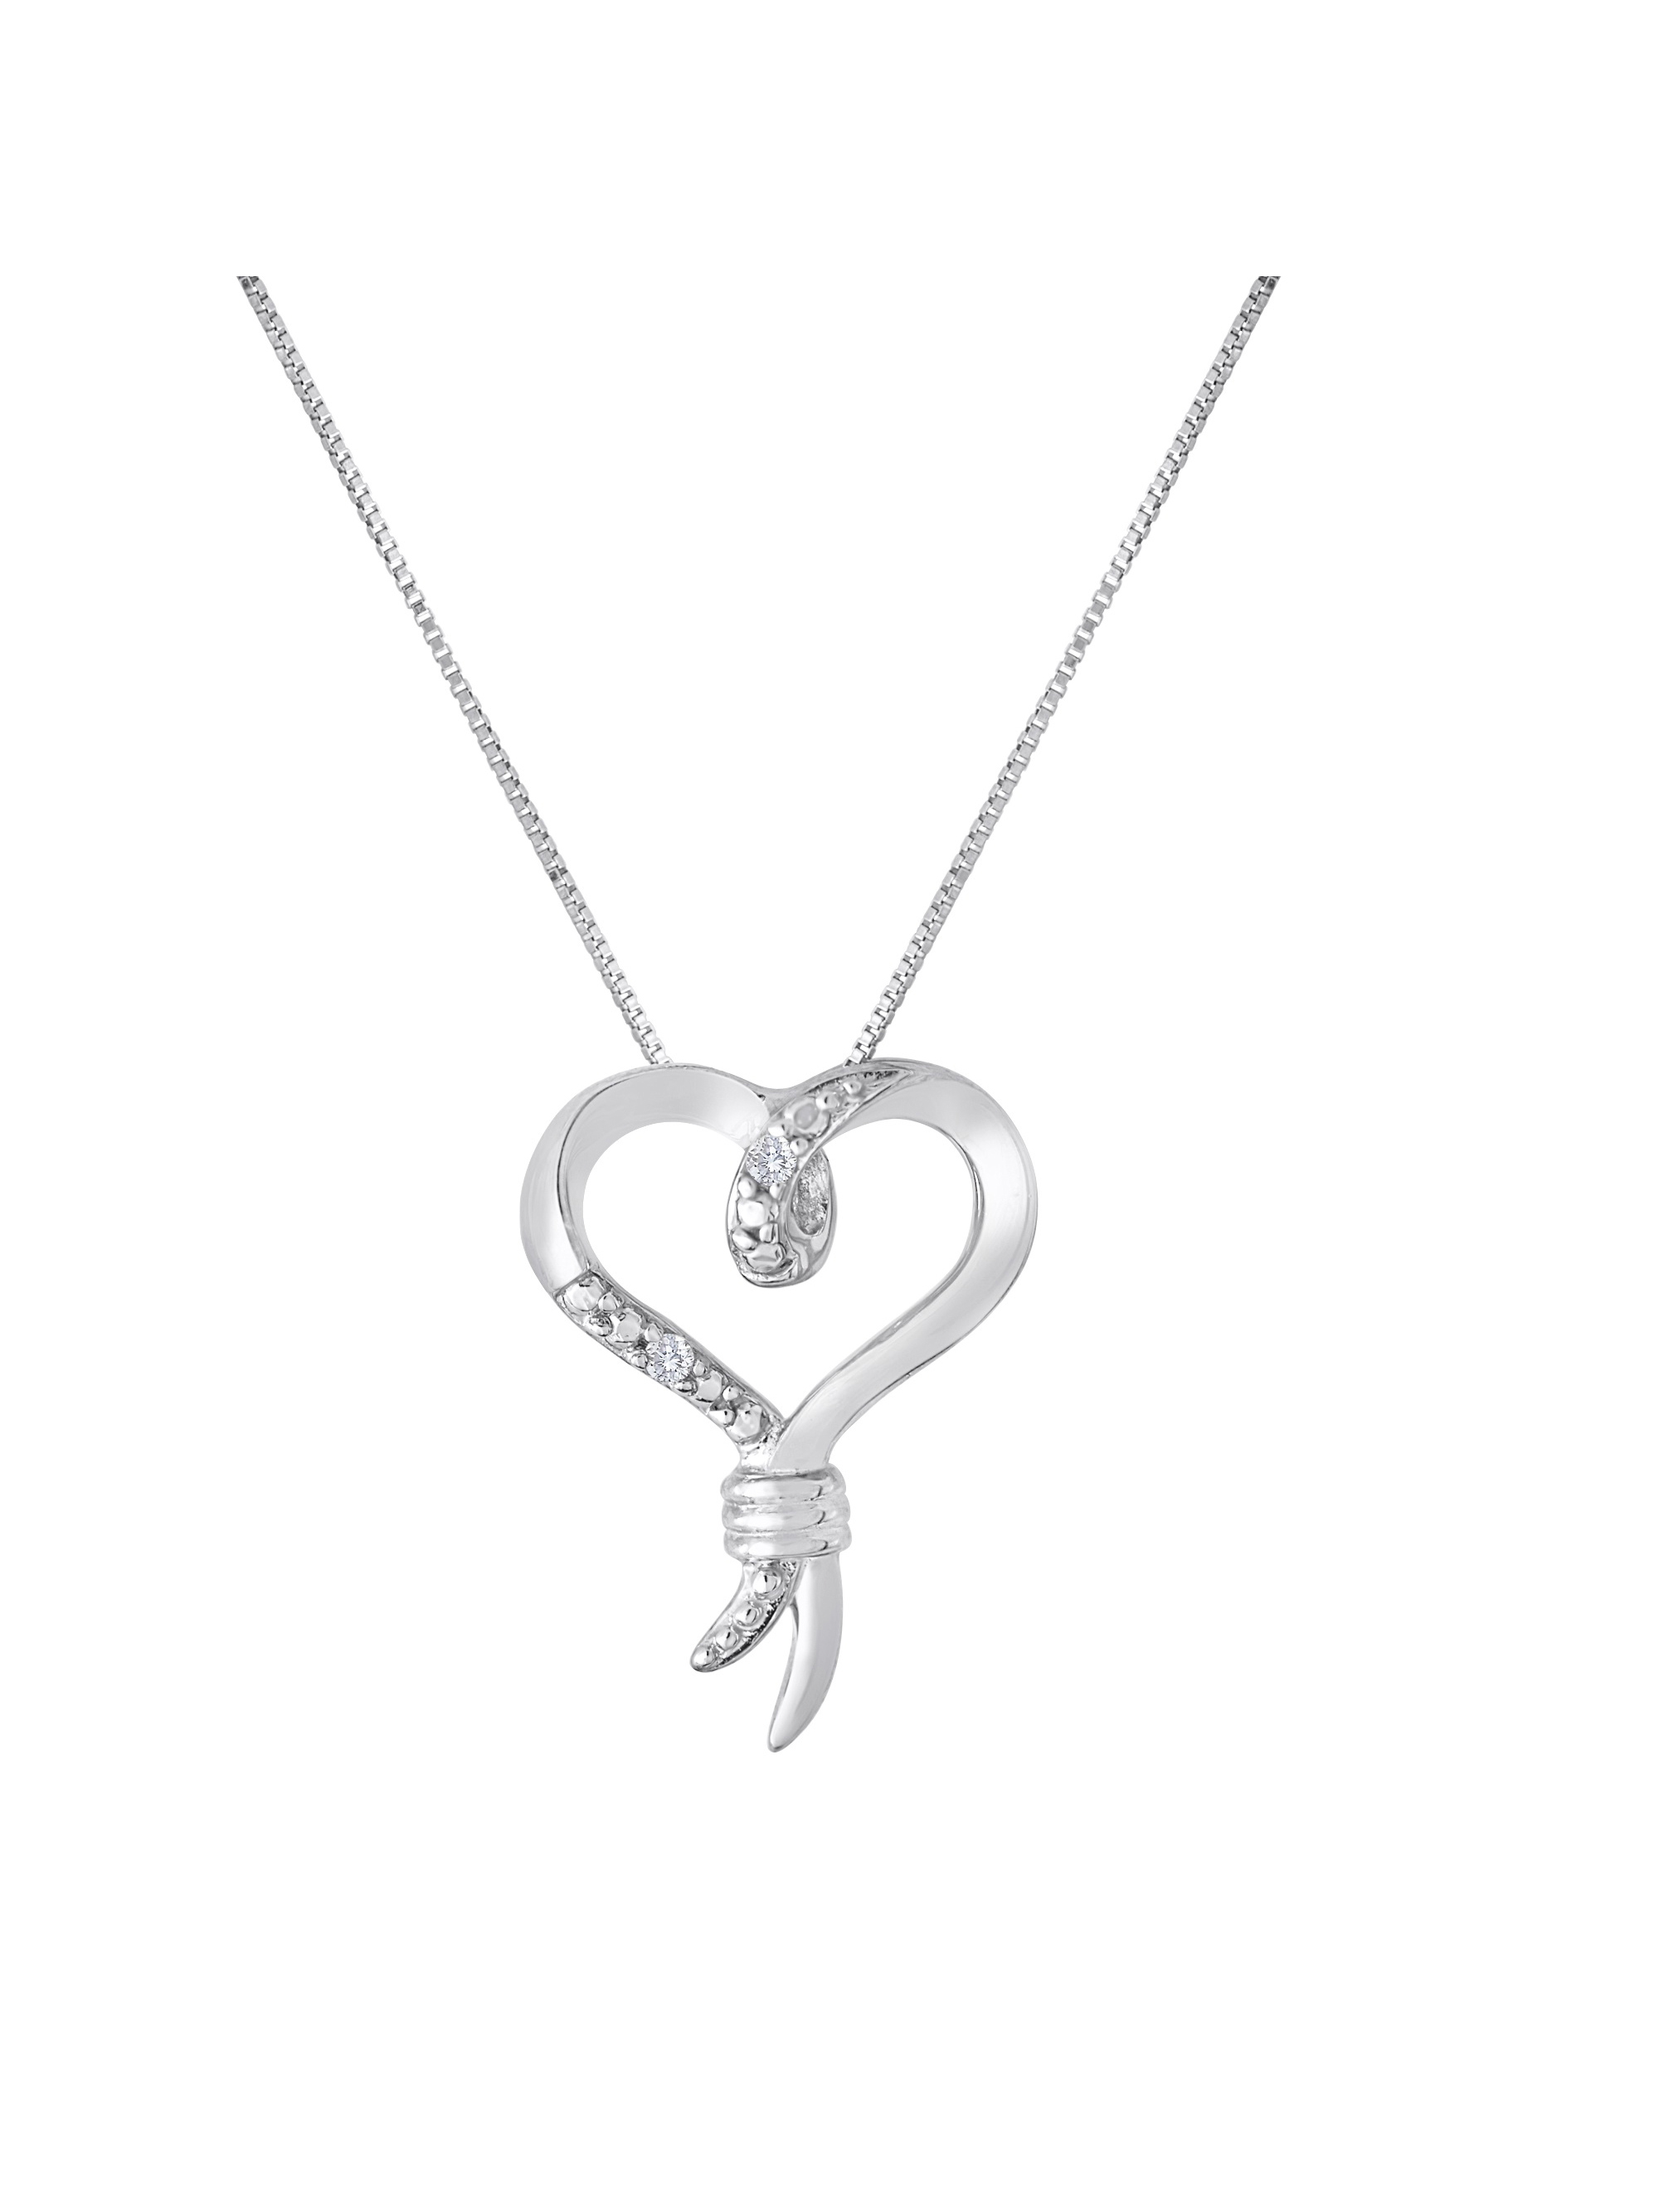 10kt White Gold Diamond Accent Heart Pendant, 18